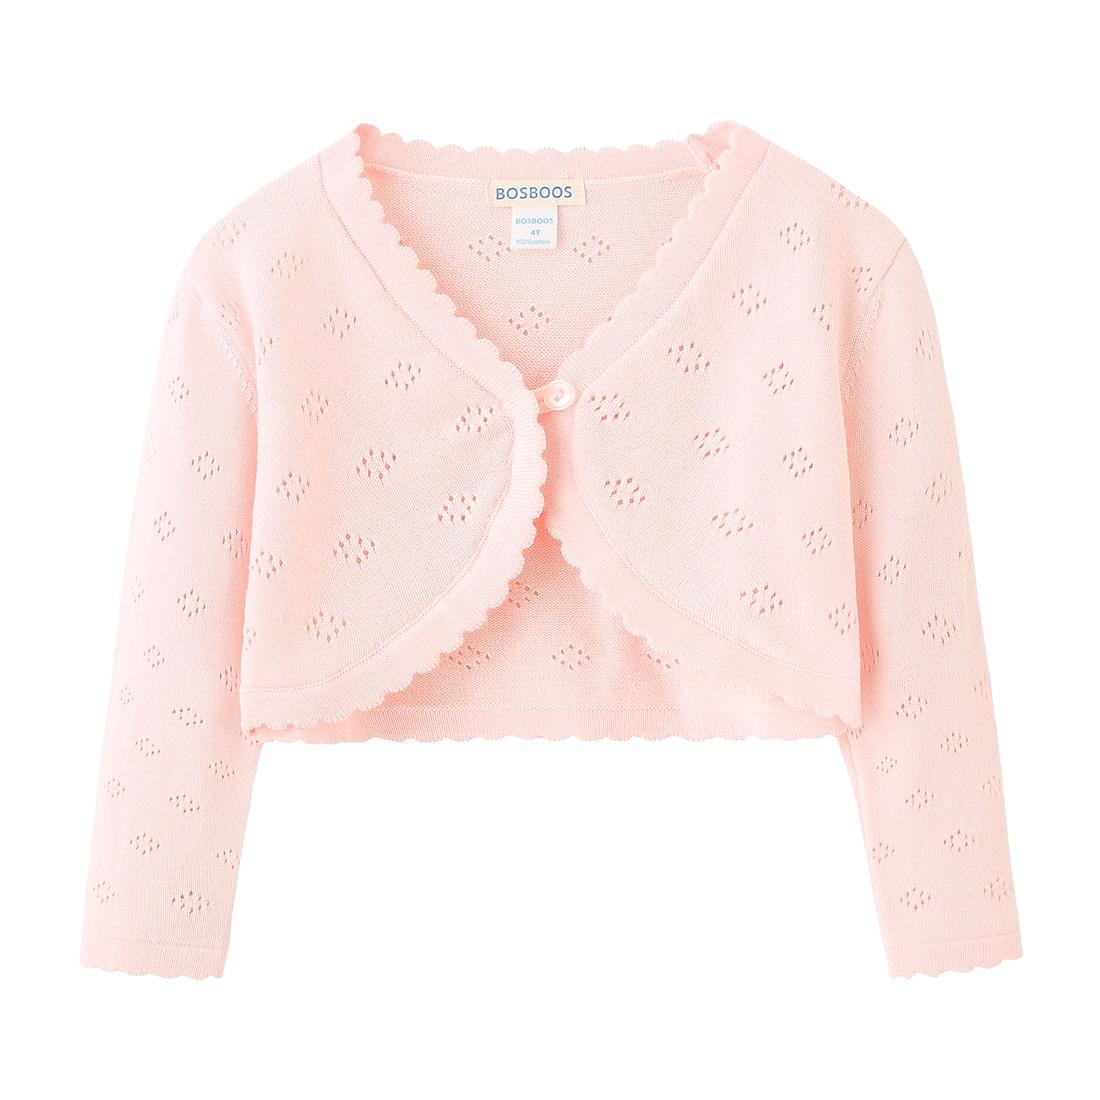 BOSBOOS Little Girls Long Sleeve 100% Cotton Solid Knit Bolero Cardigan Shrug Sweaters For Birthday Party